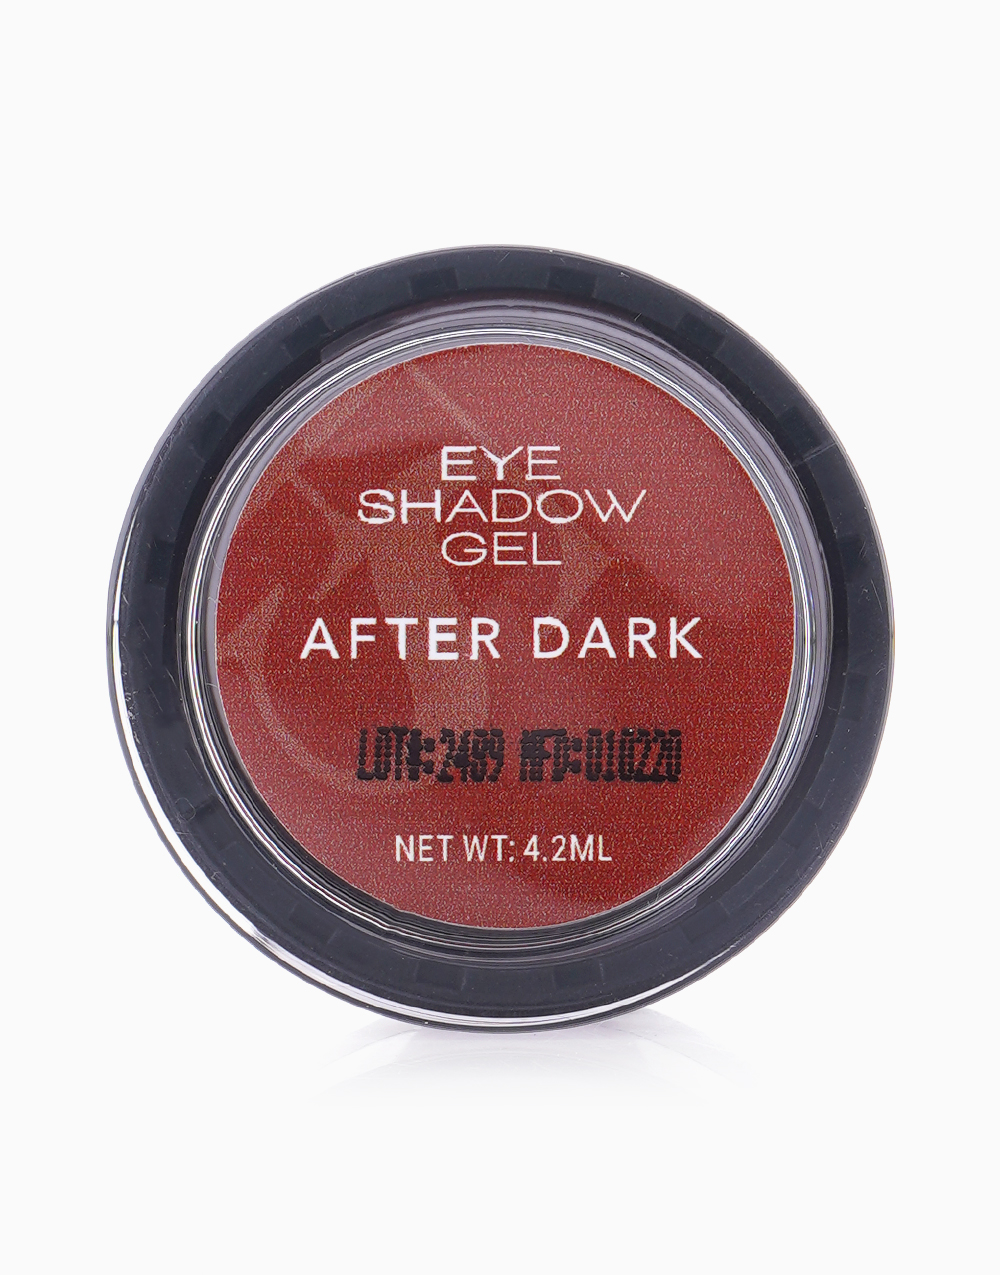 Eyeshadow Gel by FS Features & Shades | After Dark